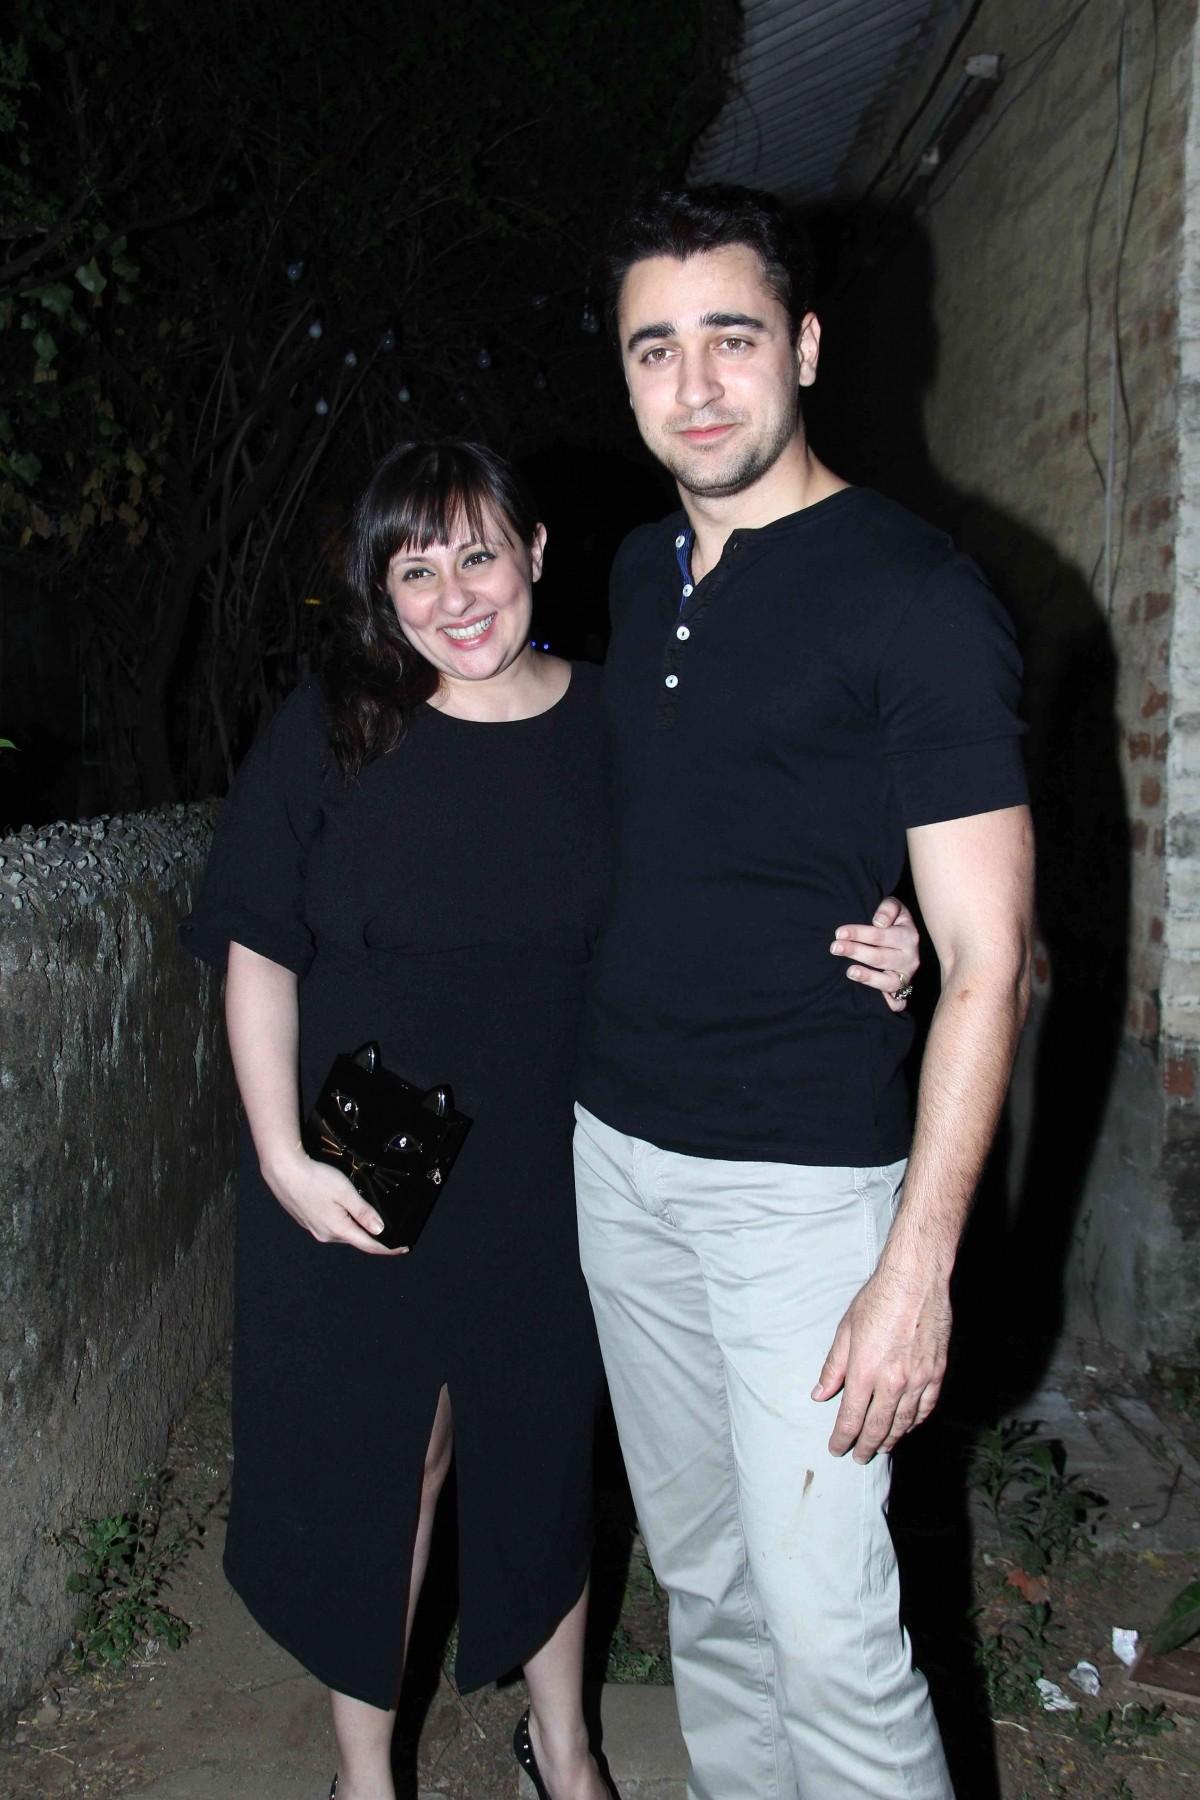 Katrina Kaif, Imran Khan and Other Celebs Attends Choreographer Bosco Martis' Birthday Bash